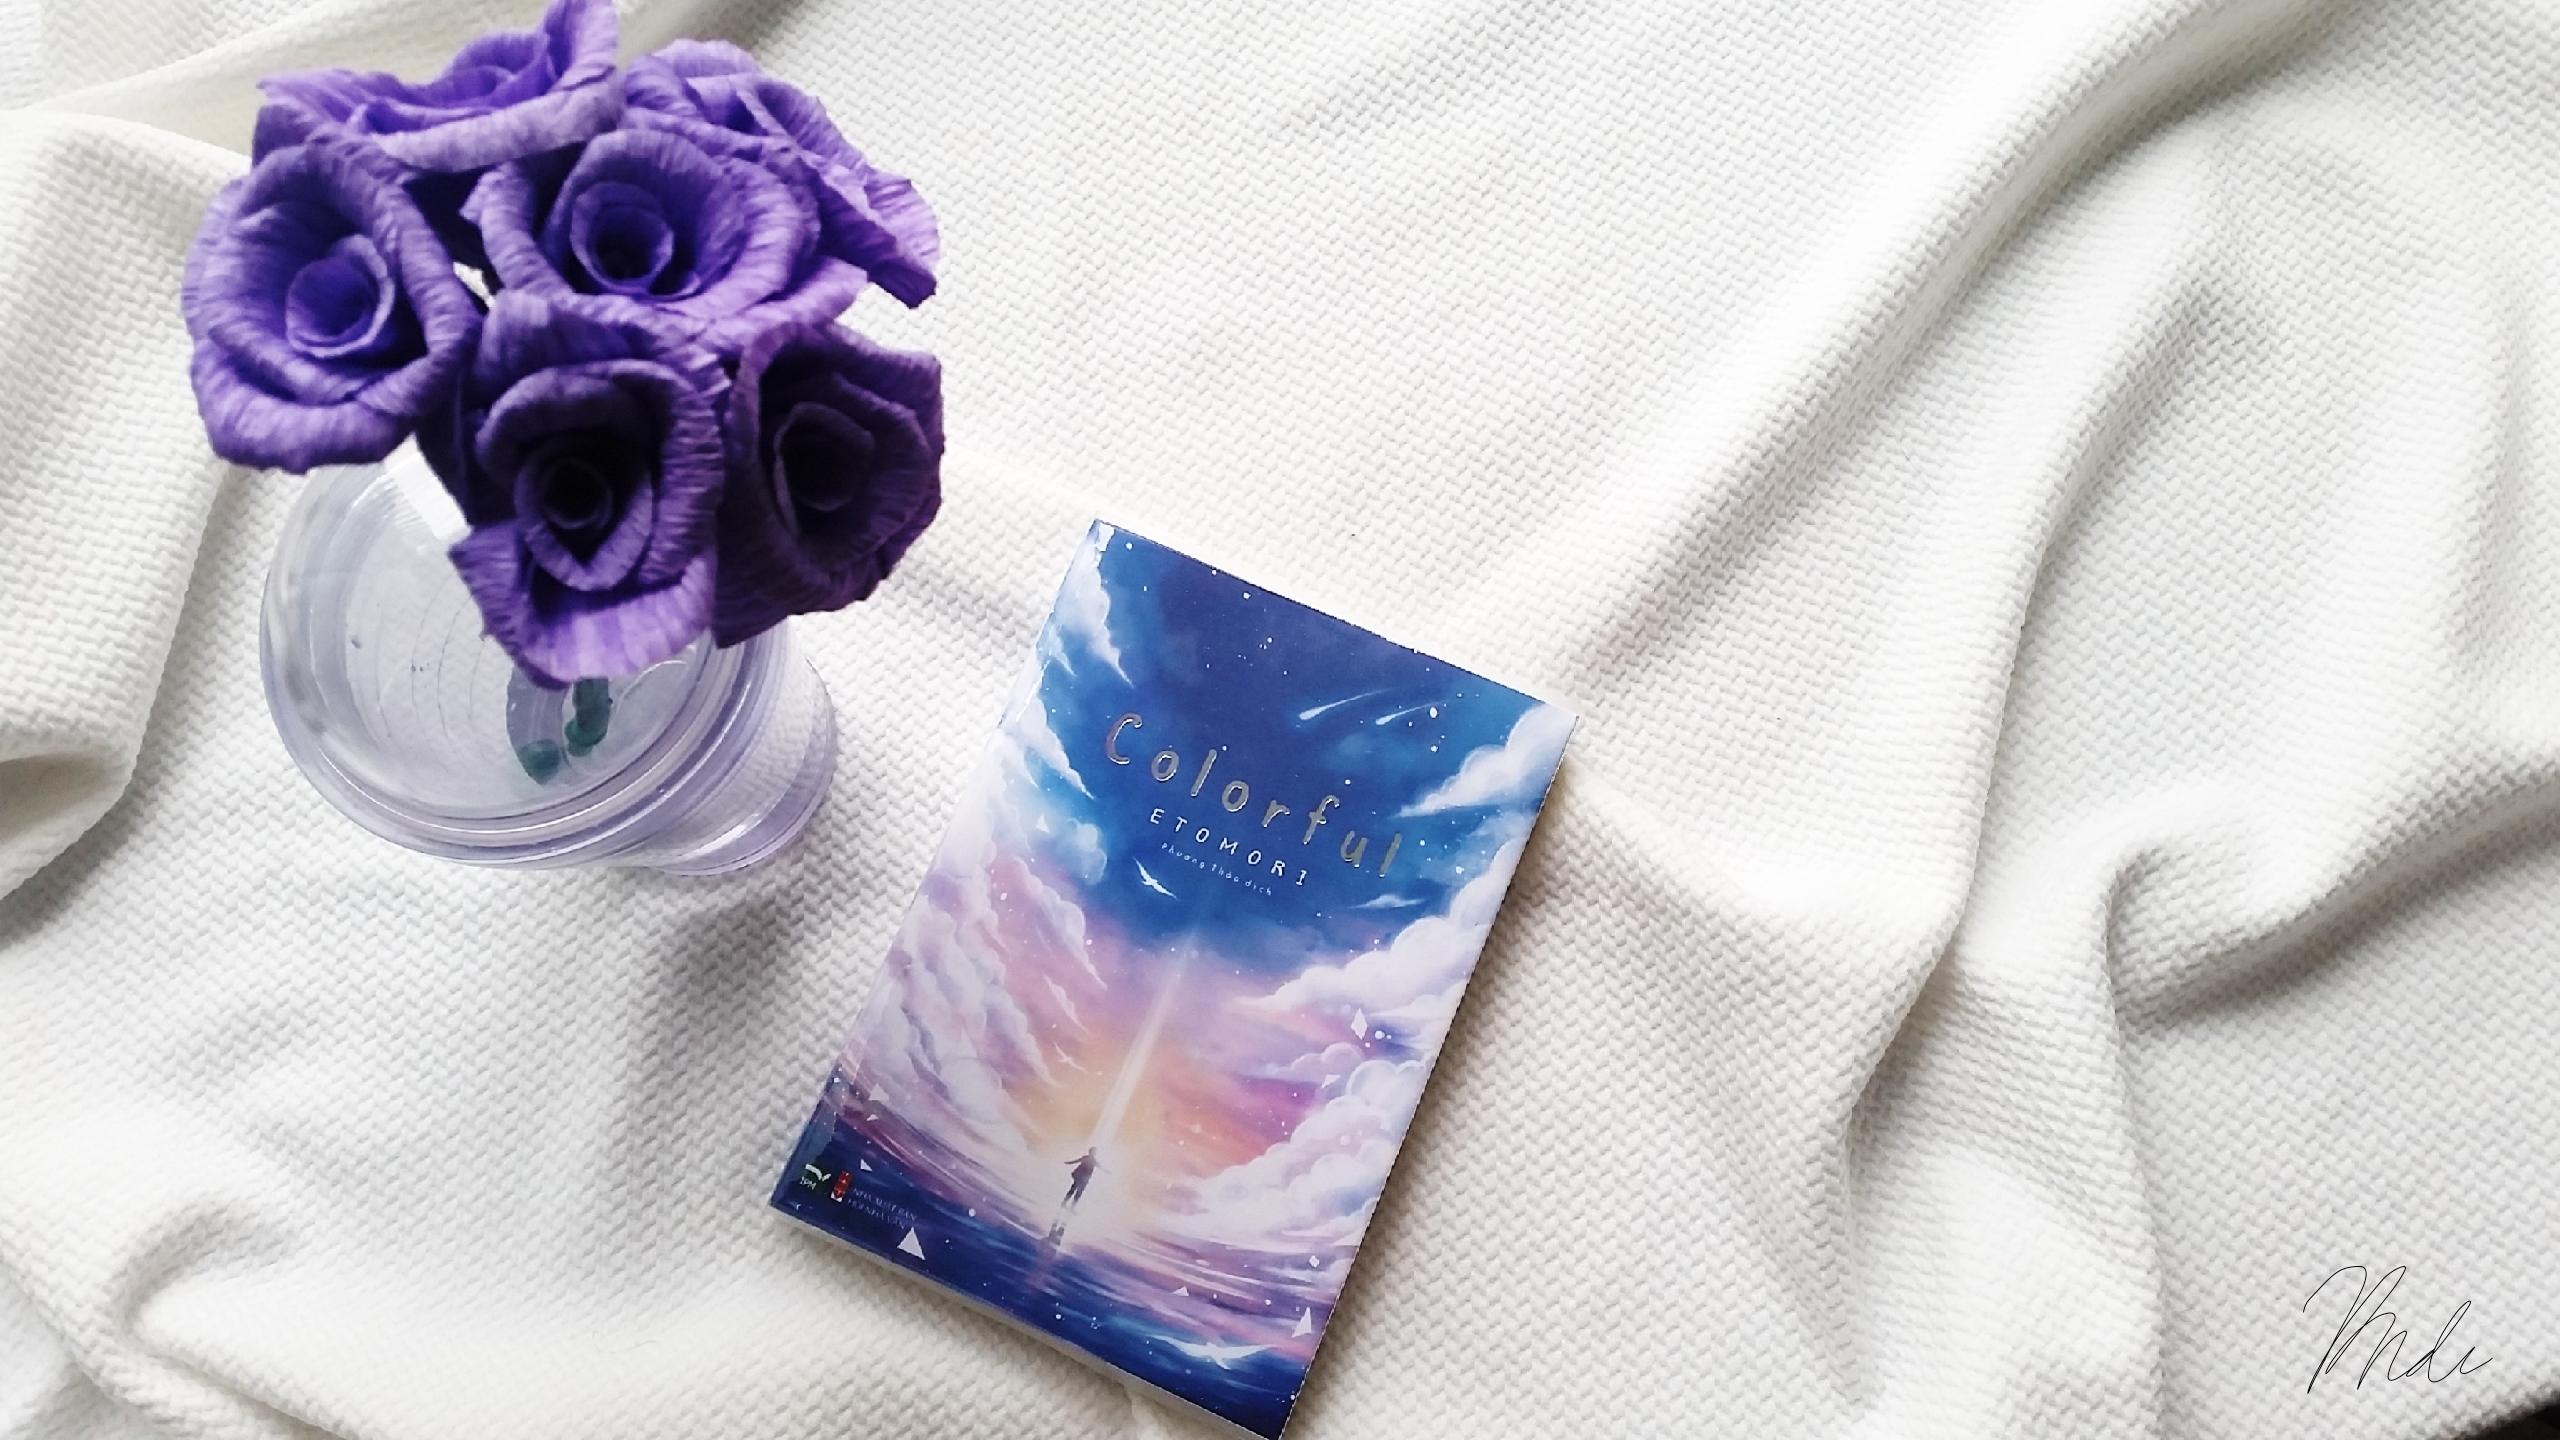 Truyện tiểu thuyết Colorful